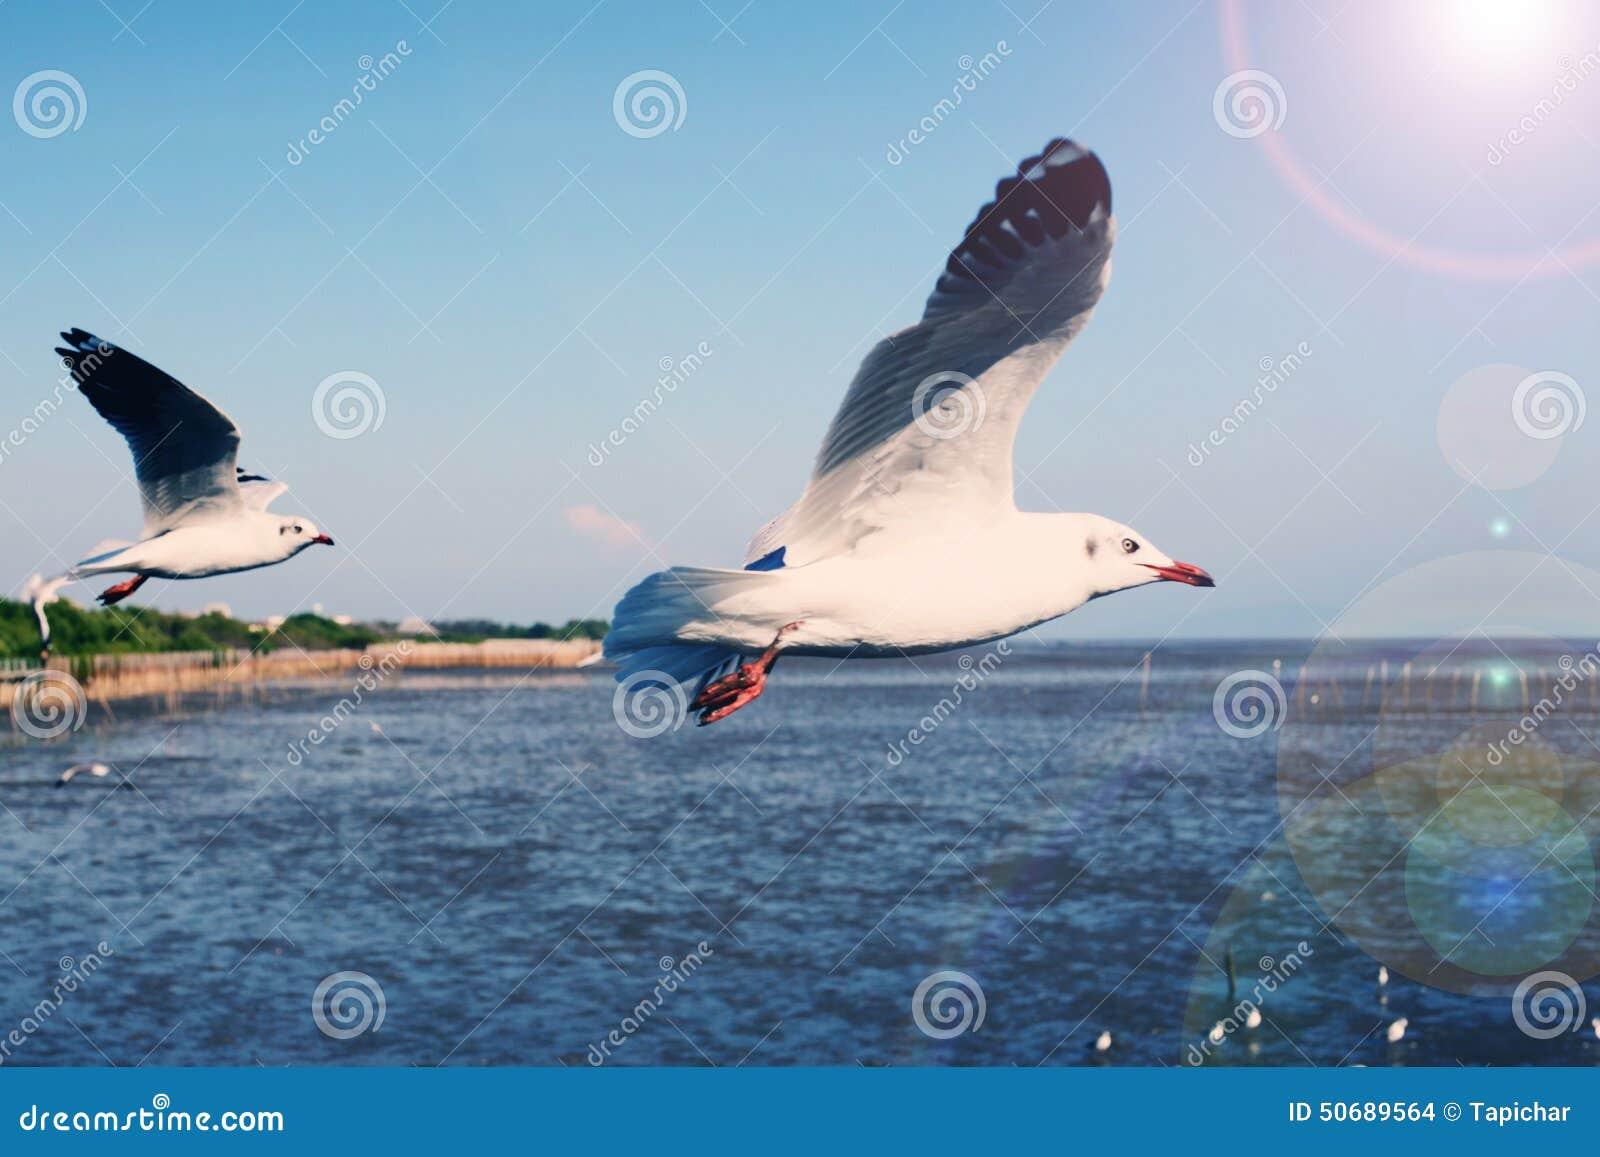 Download 飞行在蓝天的海鸥 库存照片. 图片 包括有 地图集, 海鸥, beautifuler, 蓝色, 背包, 颜色 - 50689564